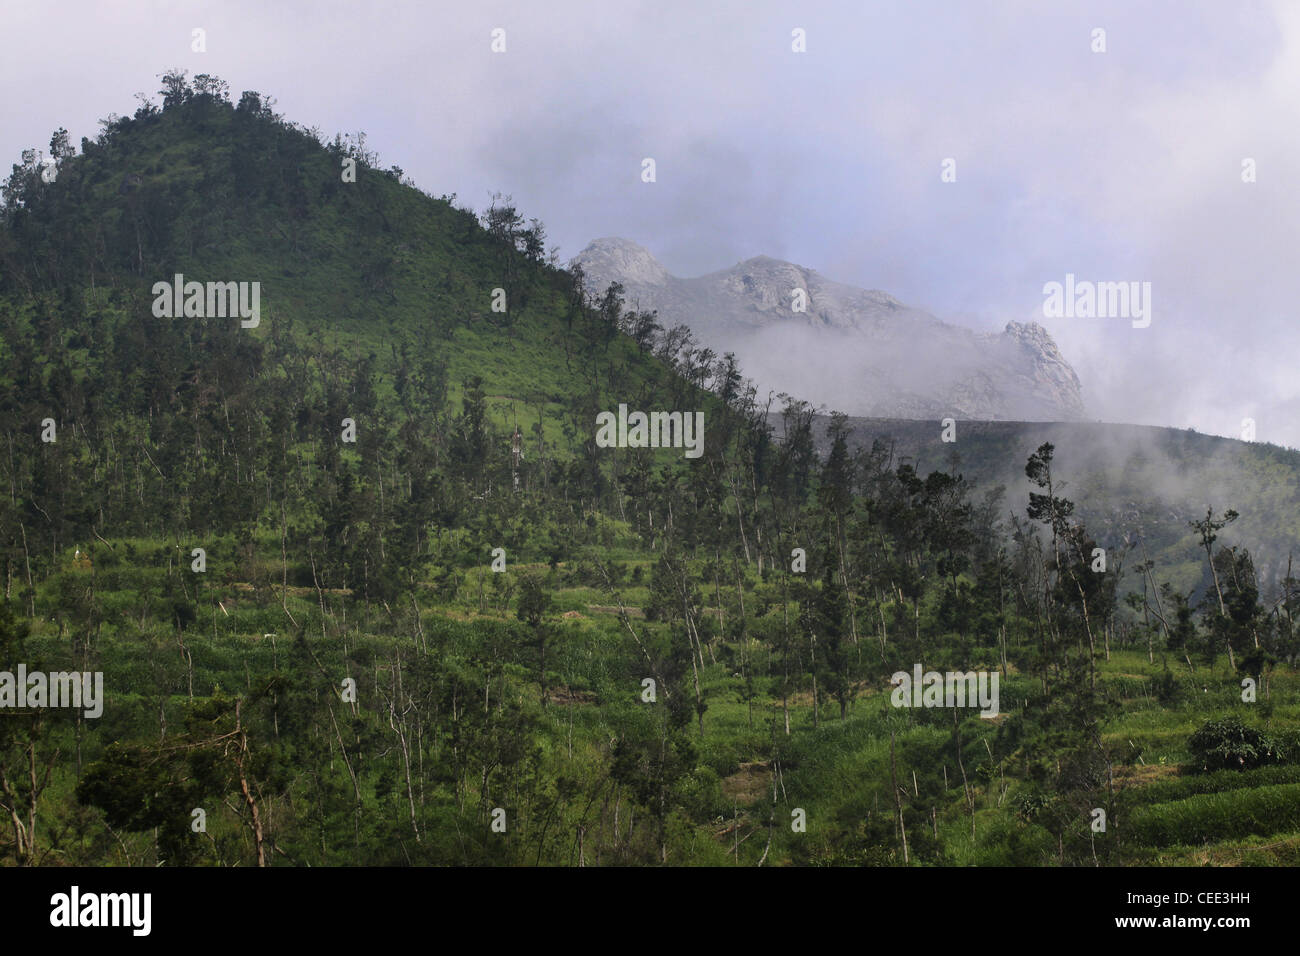 terraced farm fields below crater Mount Merapi Yogyakarta Indonesia - Stock Image